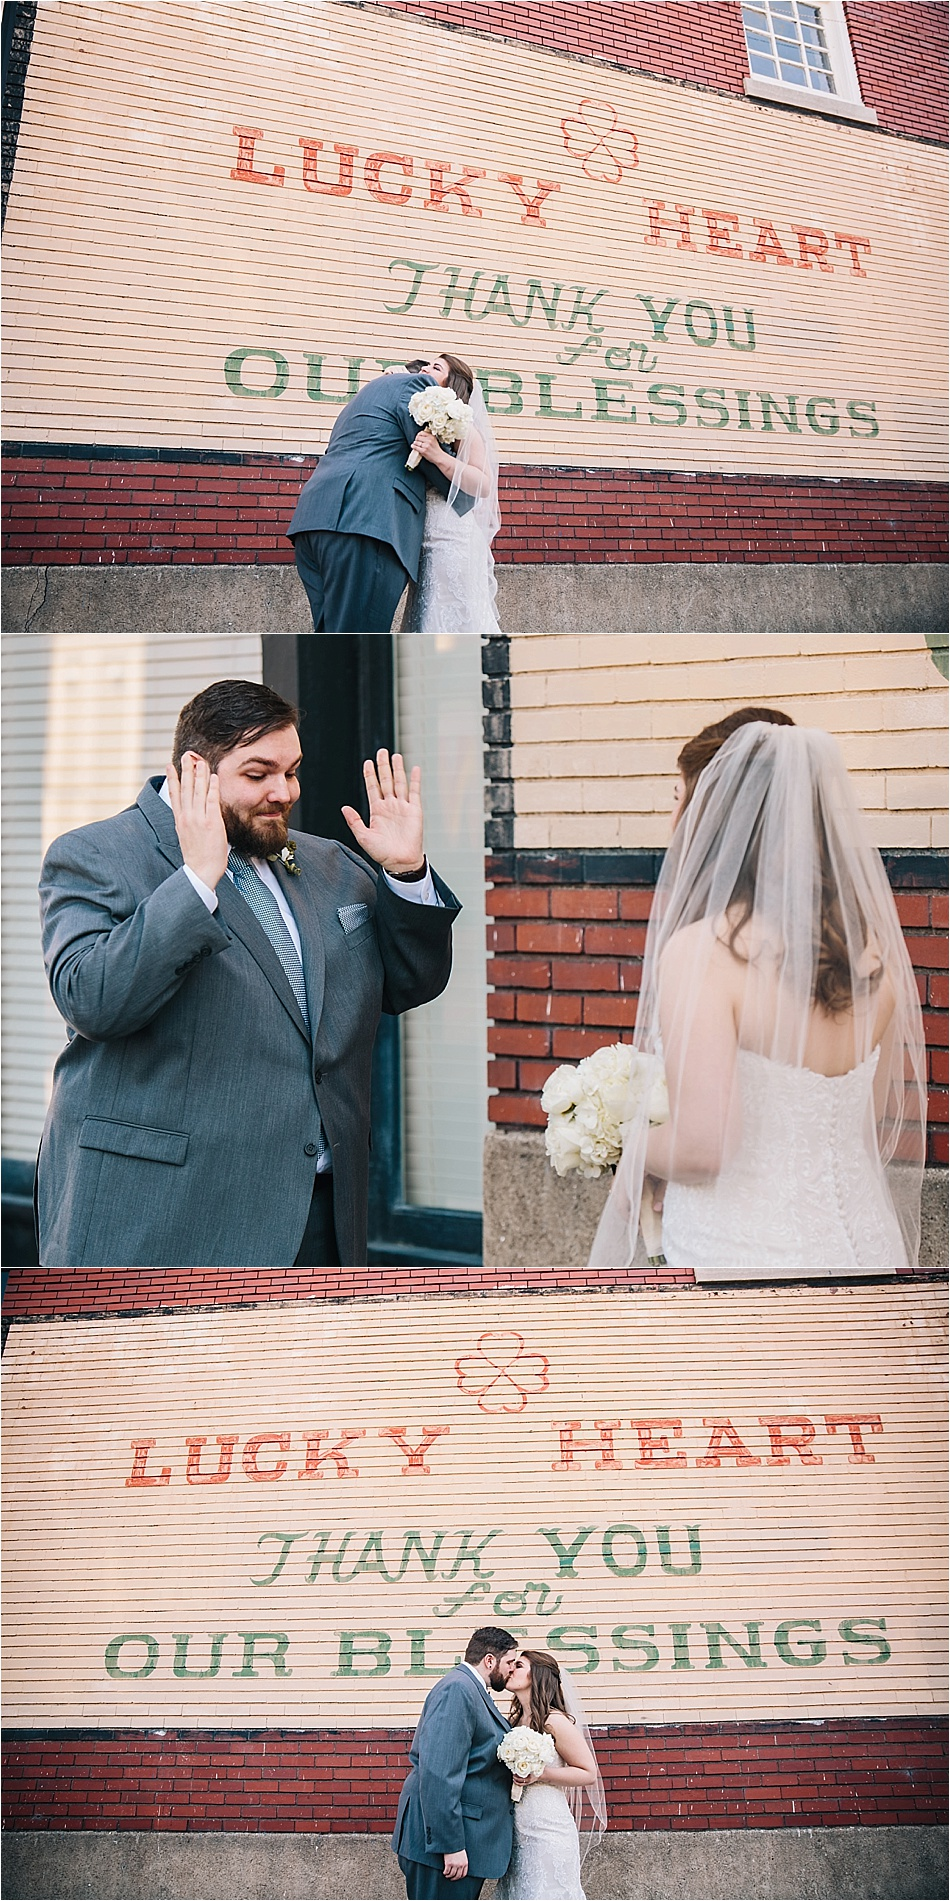 CK-Photo-Nashville-Wedding-Photographer-_0009.jpg